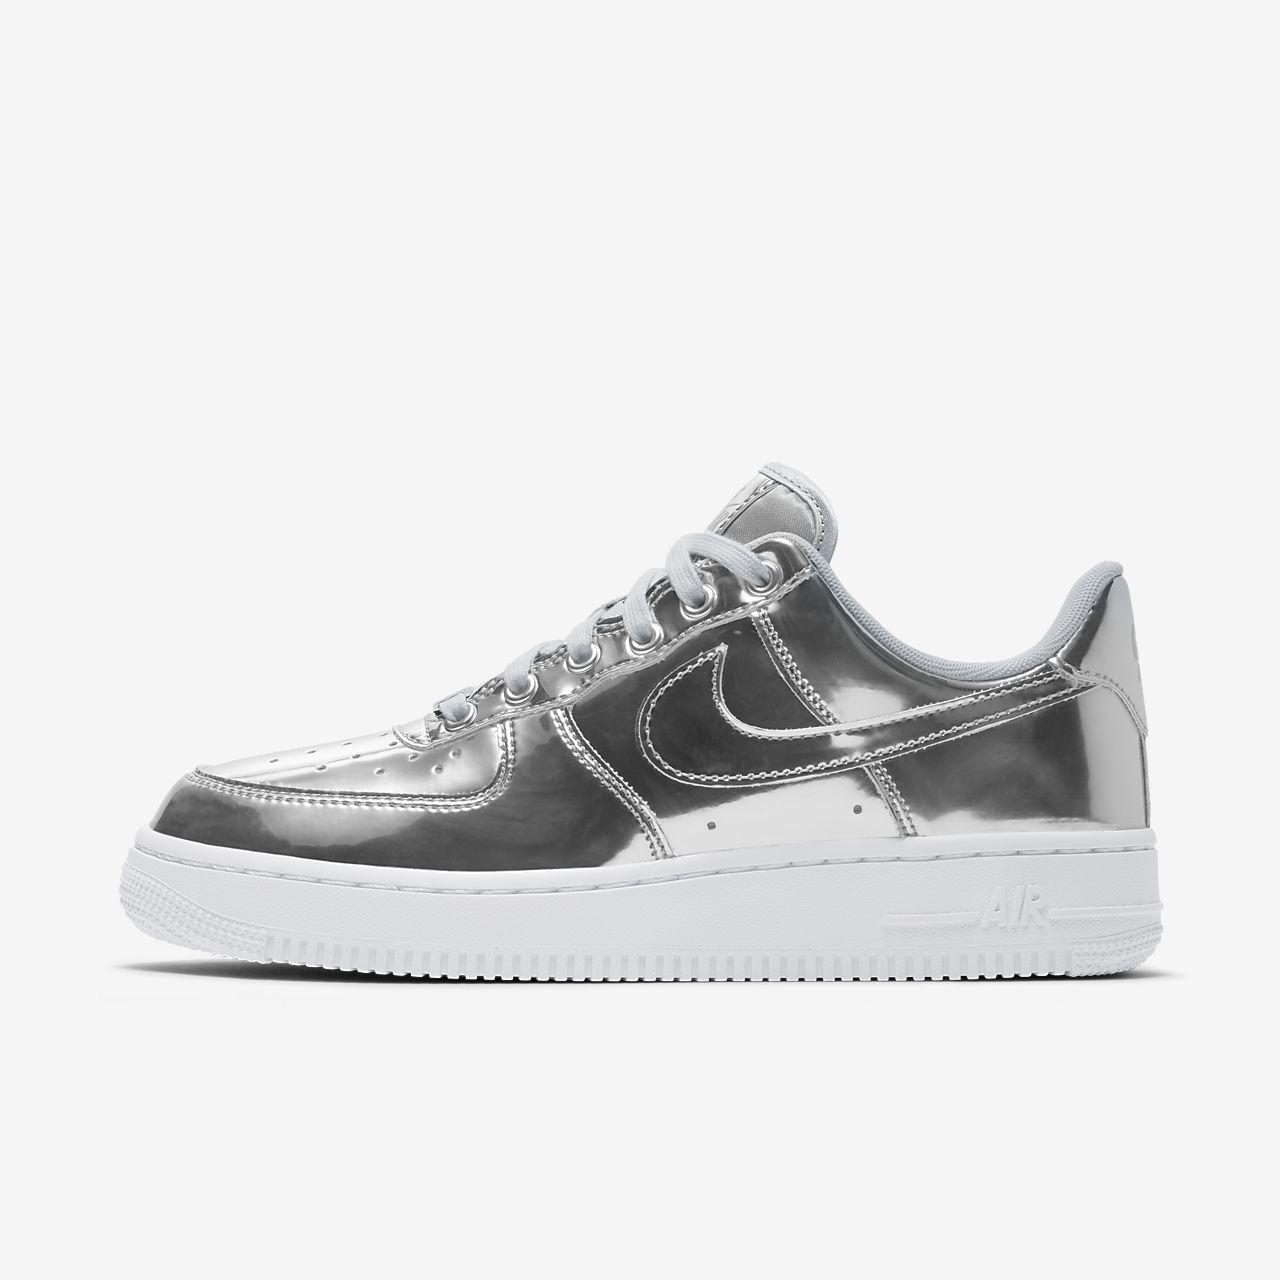 Nike Air Force 1 SP Damenschuh